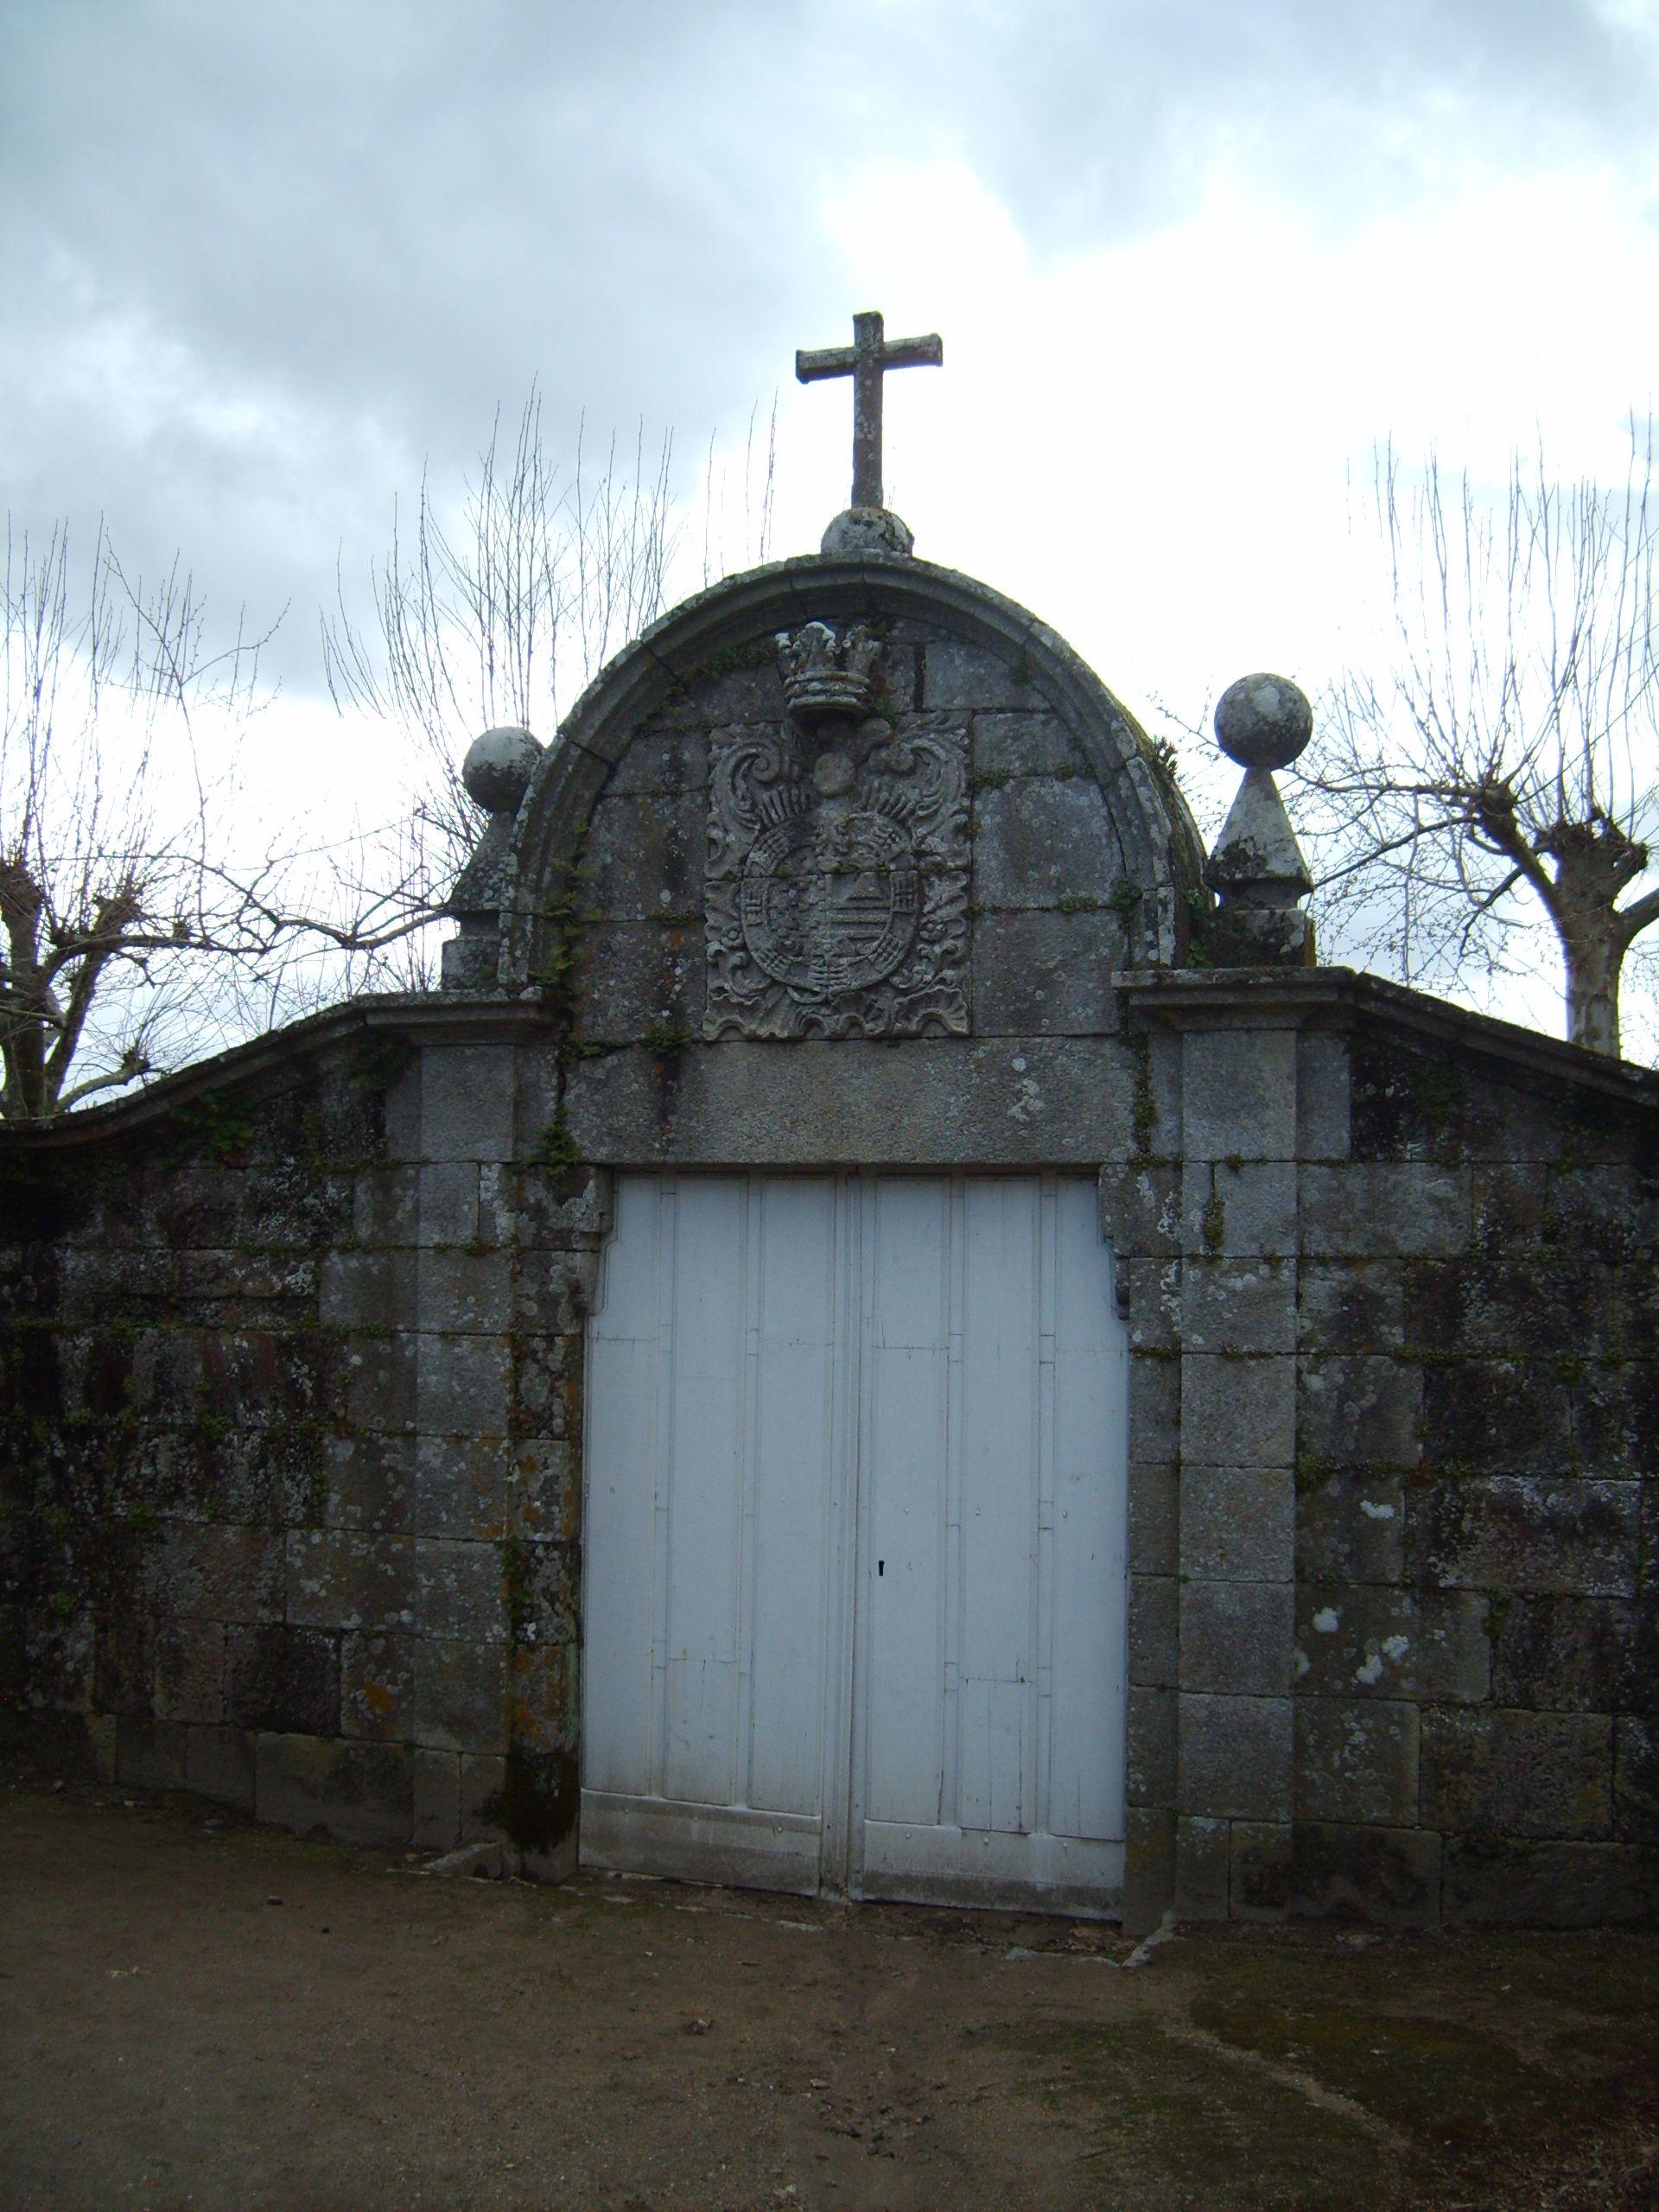 http://upload.wikimedia.org/wikipedia/commons/c/cf/Pazo_de_Oca_-_5_-_Porta.JPG